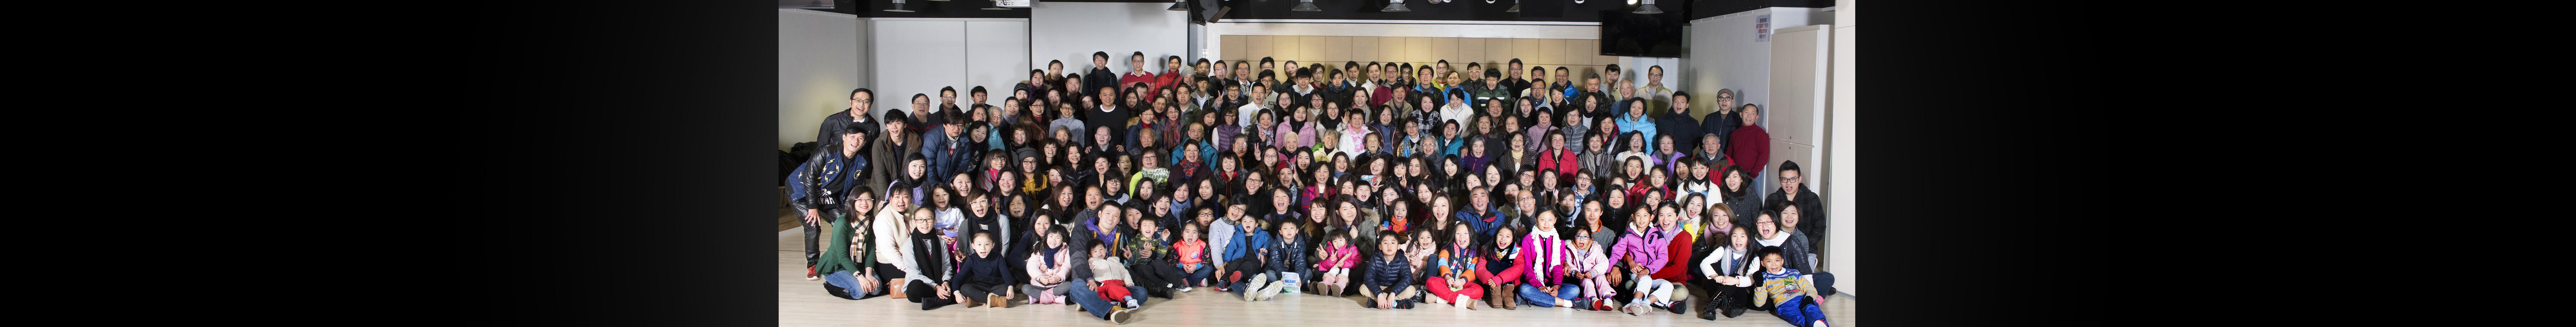 20160124_whole_church_photo1